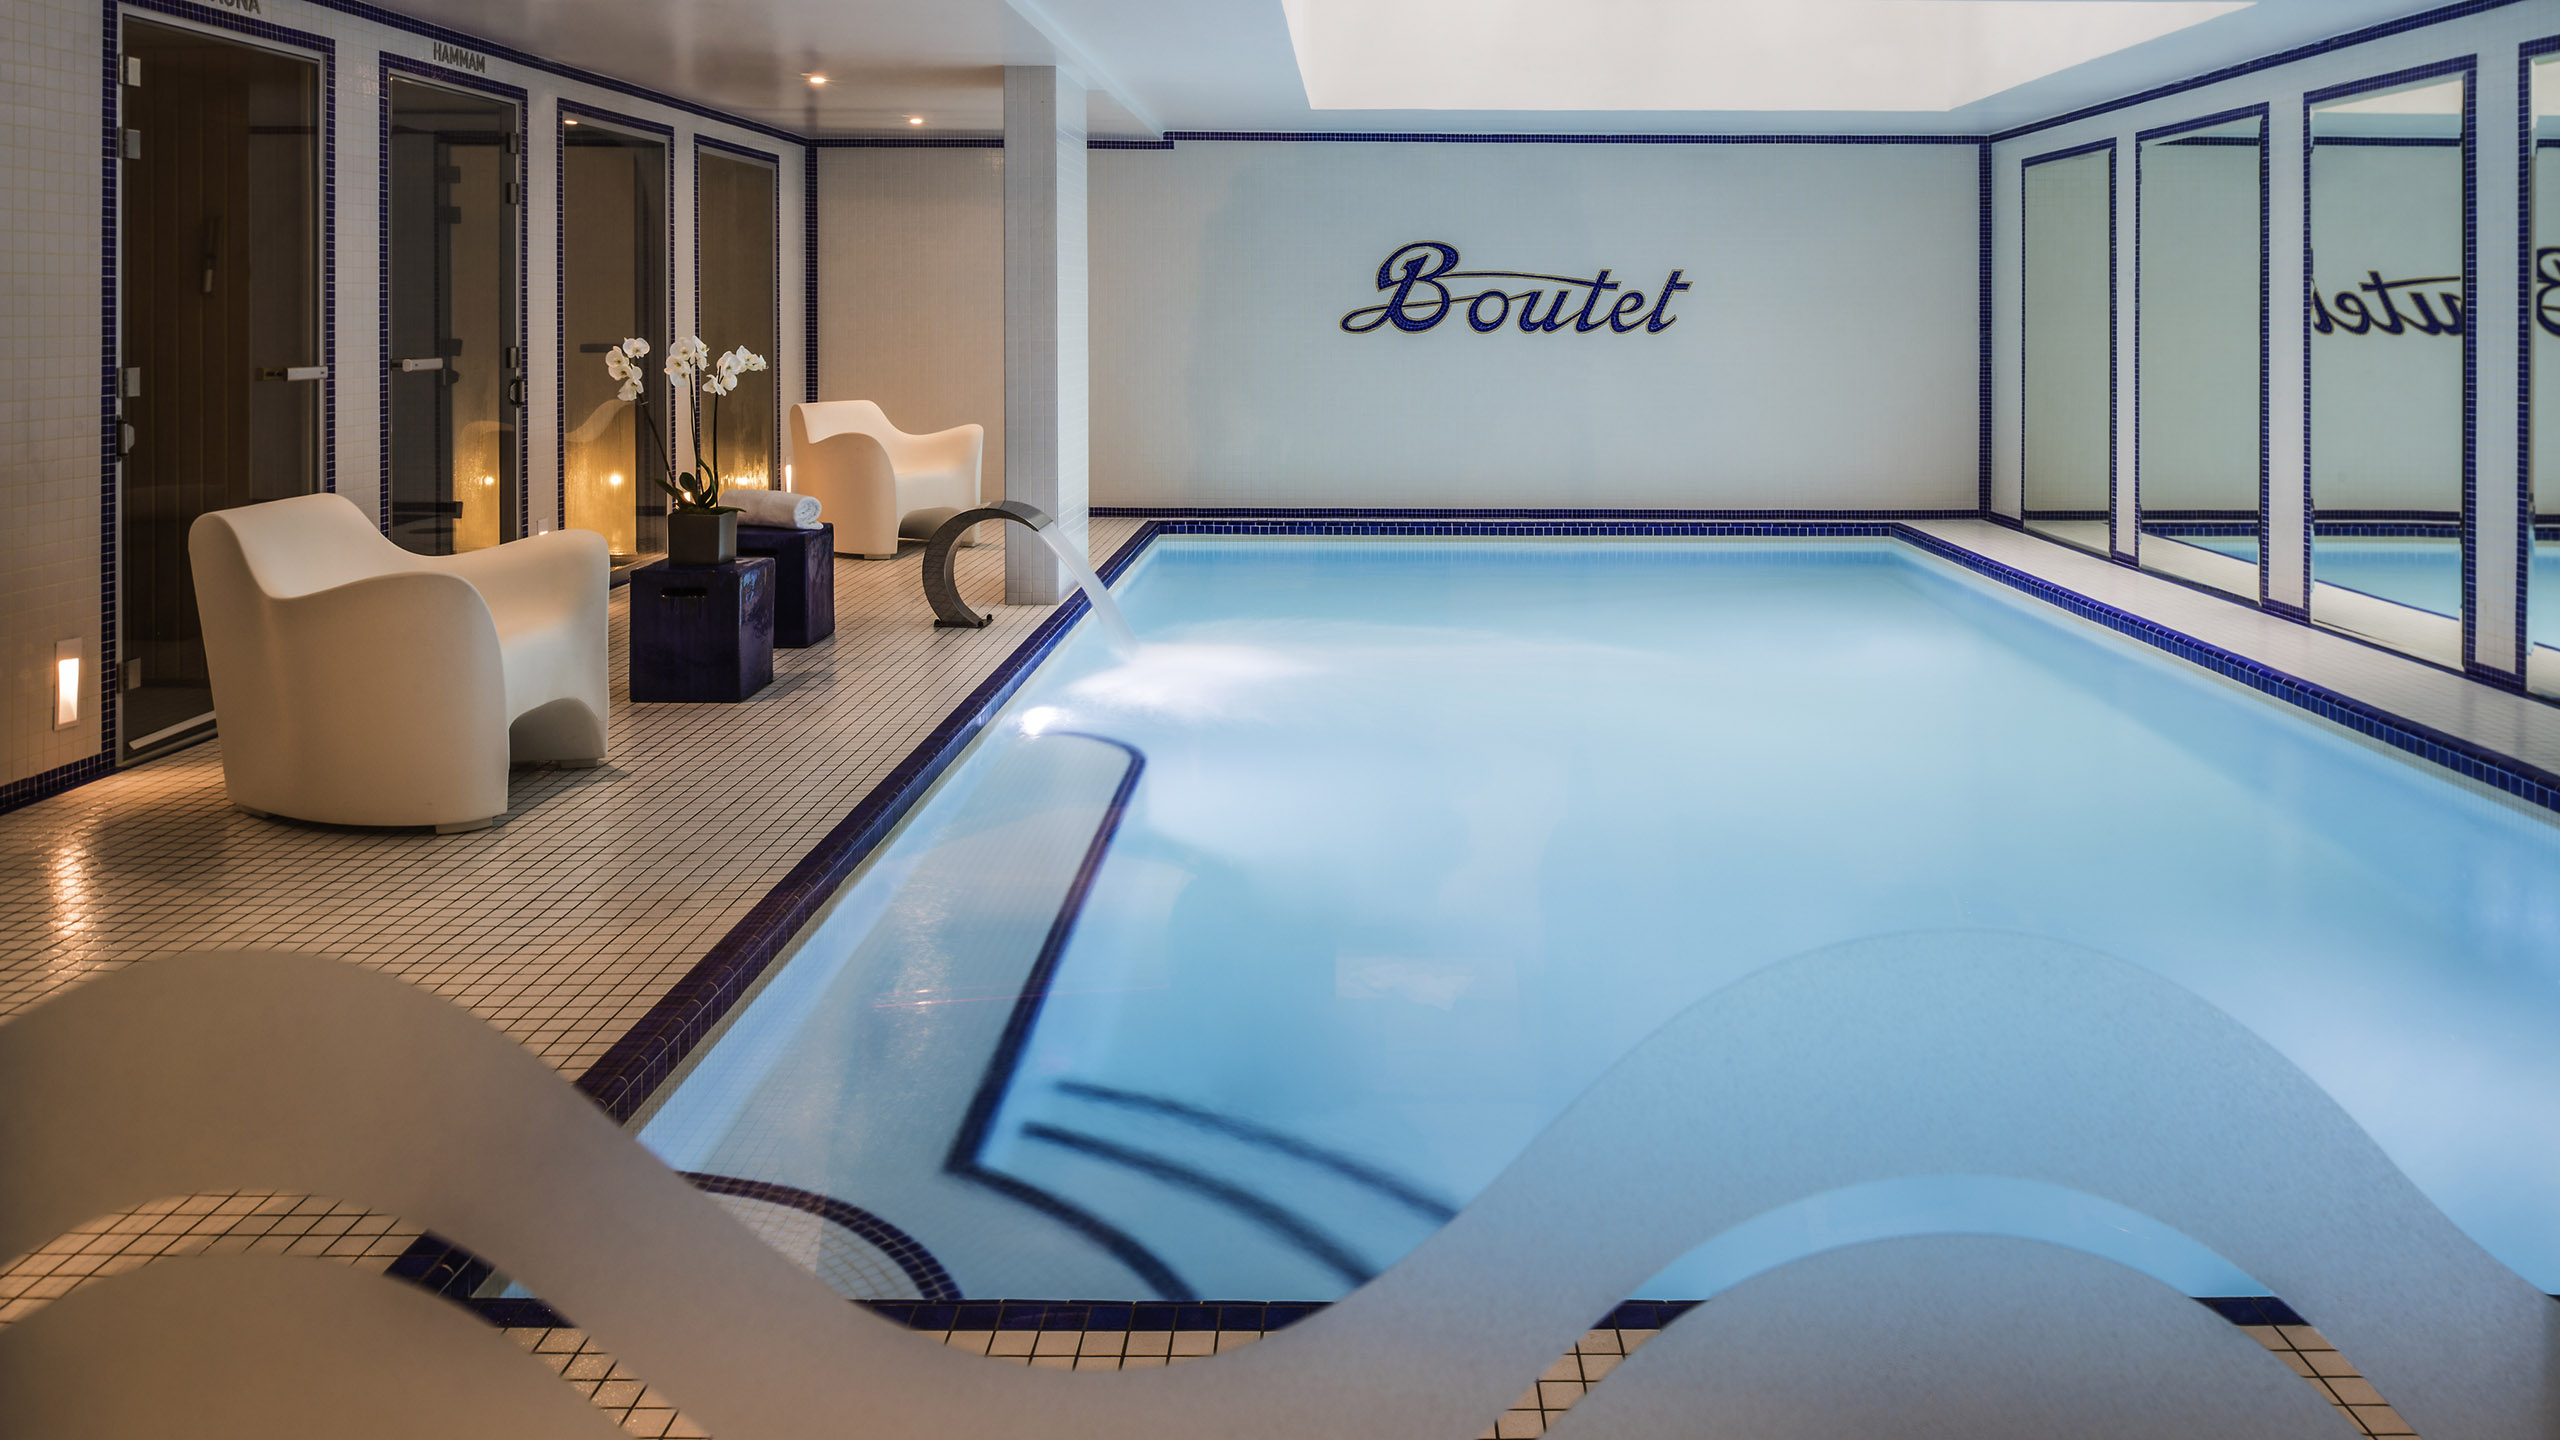 Luxury Hotel Paris – Hotel Paris Bastille Boutet-Mgallery concernant Piscine Balard